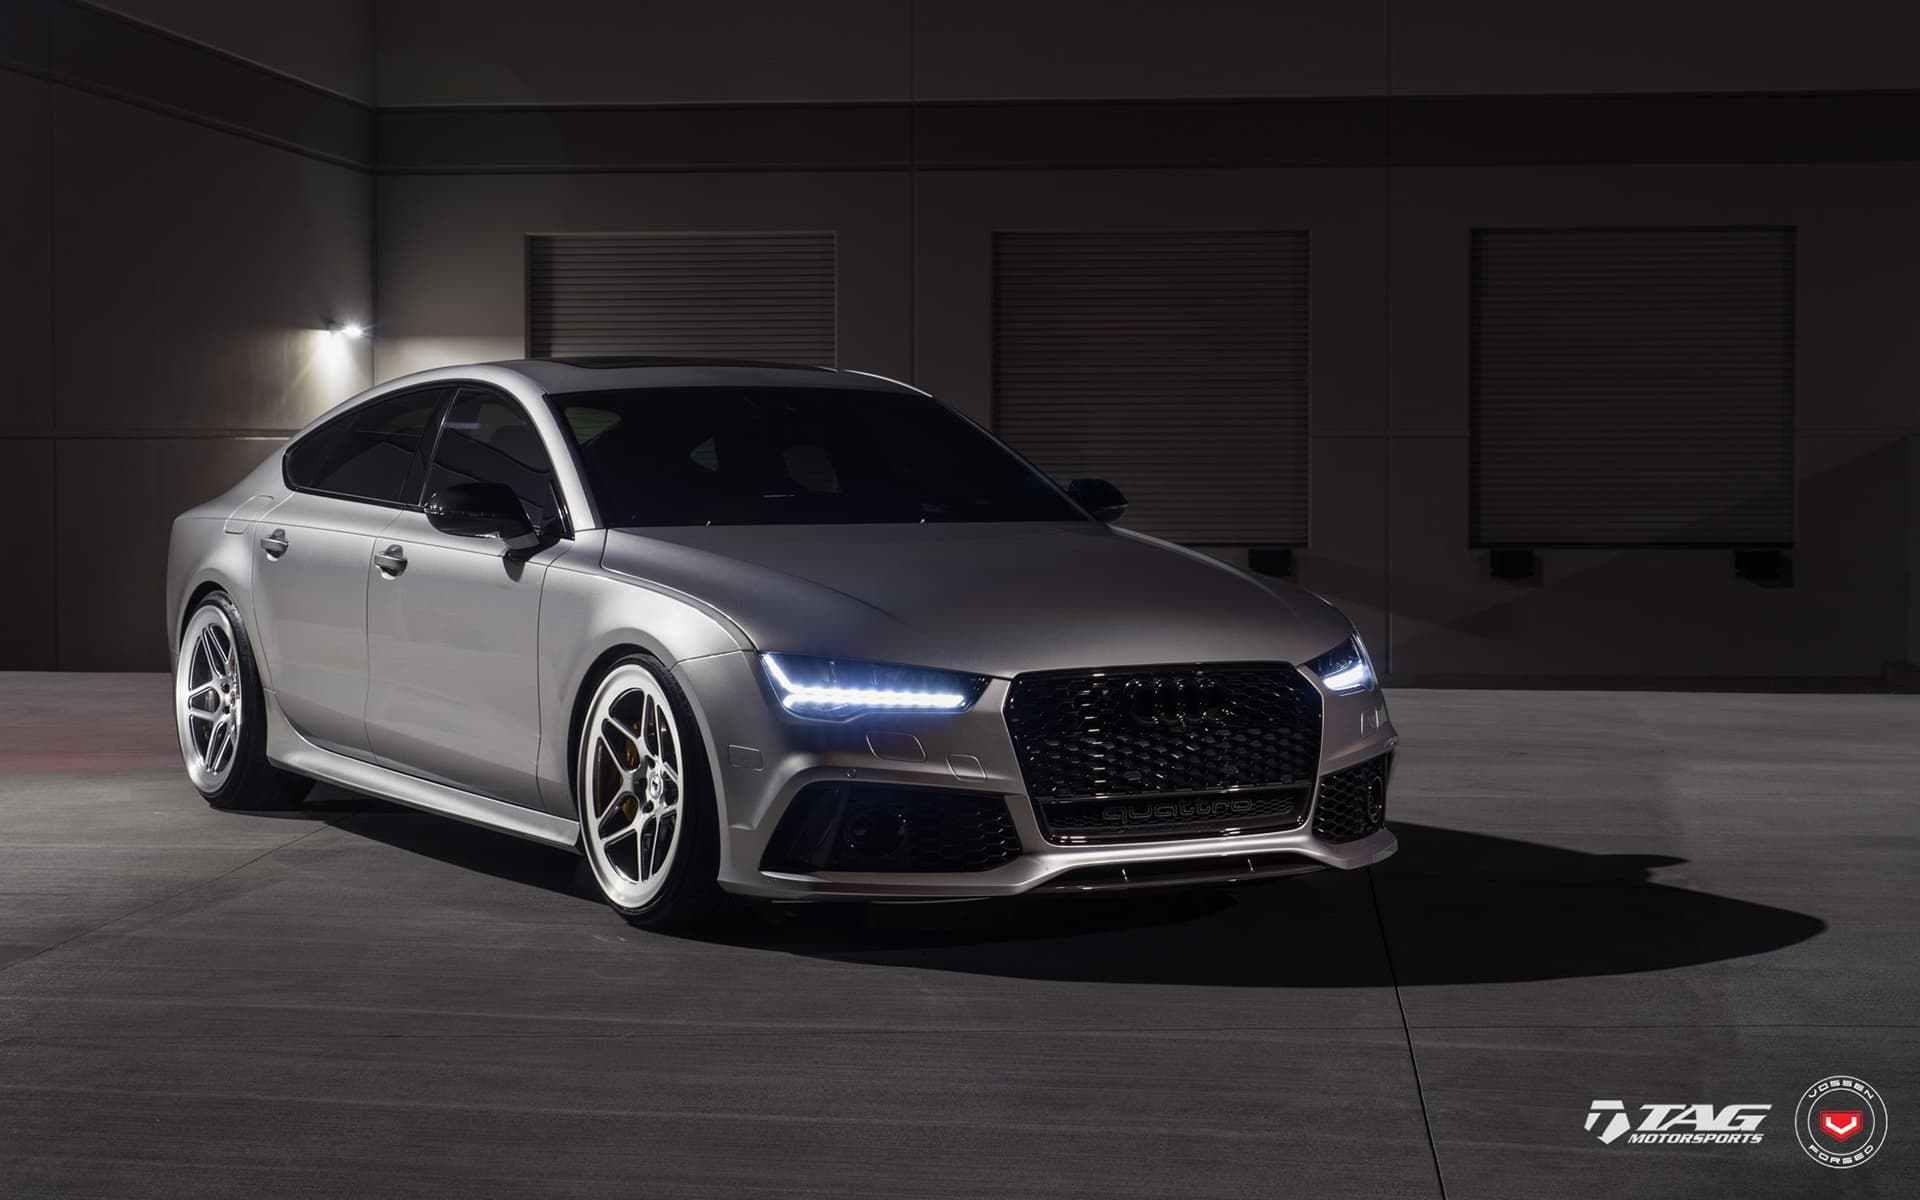 Audi Rs7 0 60 >> Top Cars Of 2018 Wallpapers - Wallpaper Cave